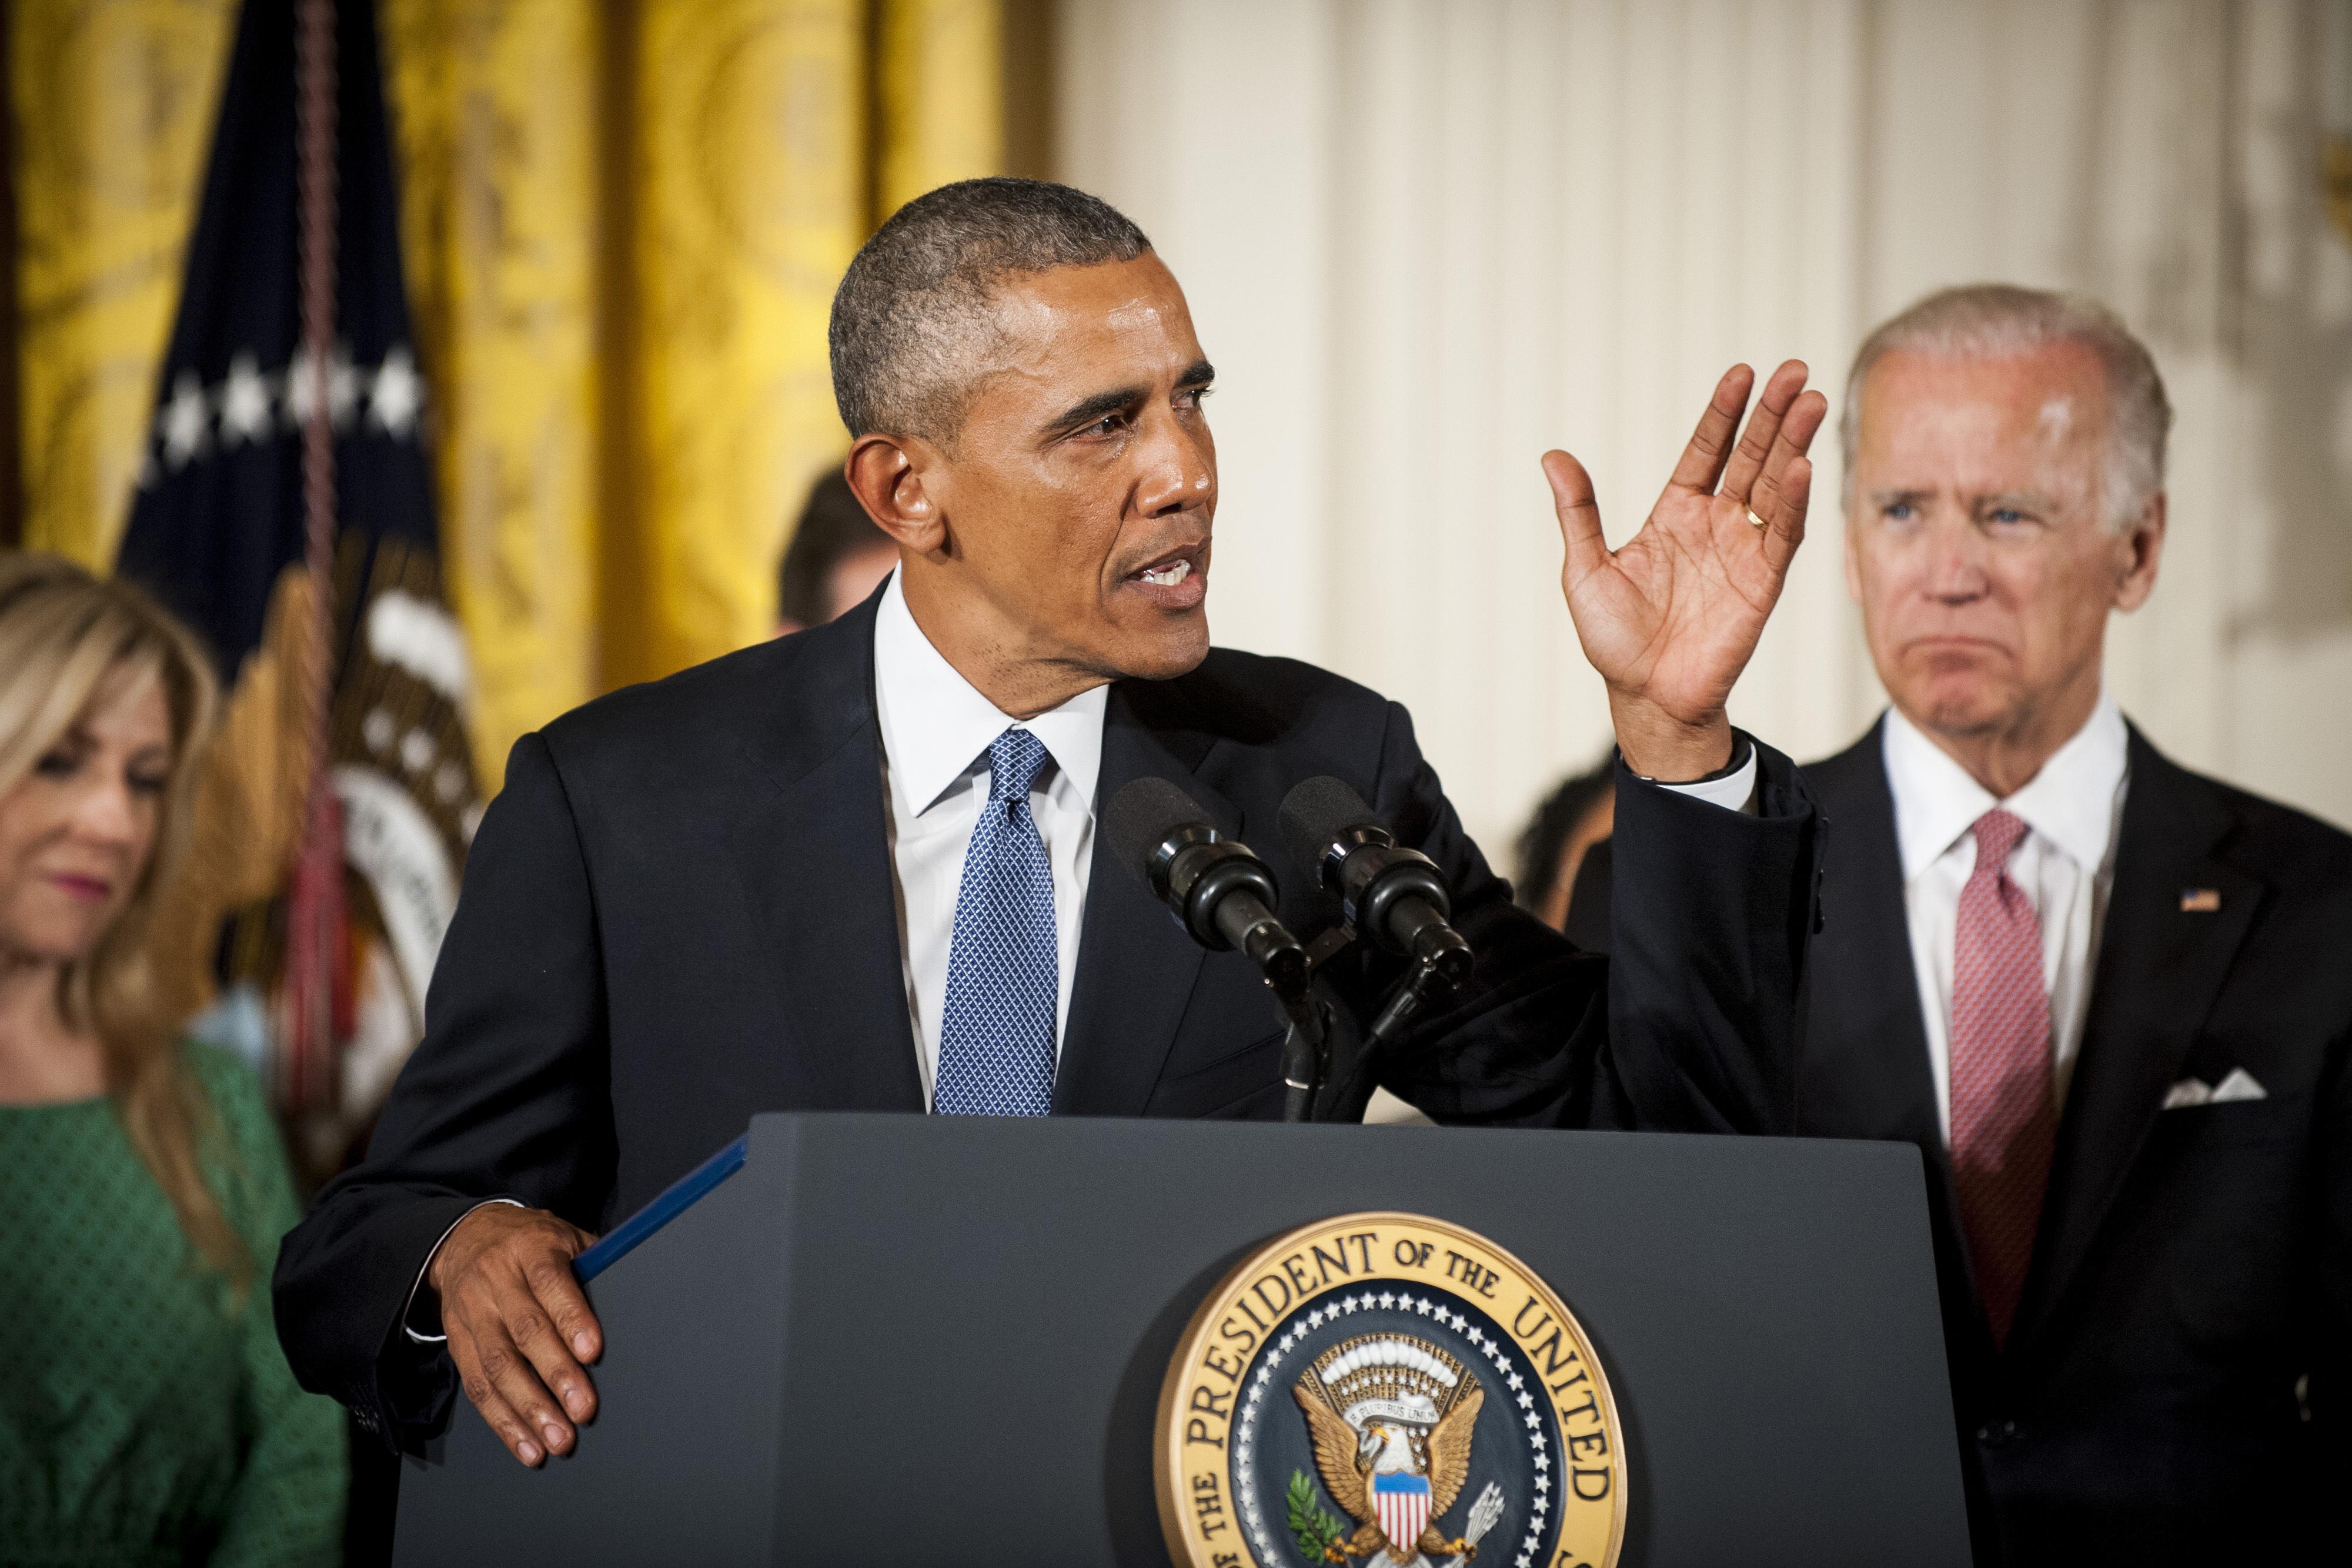 Vice President Joe Biden looks on as President Barack Obama announces his executive action on gun control on Jan. 5.